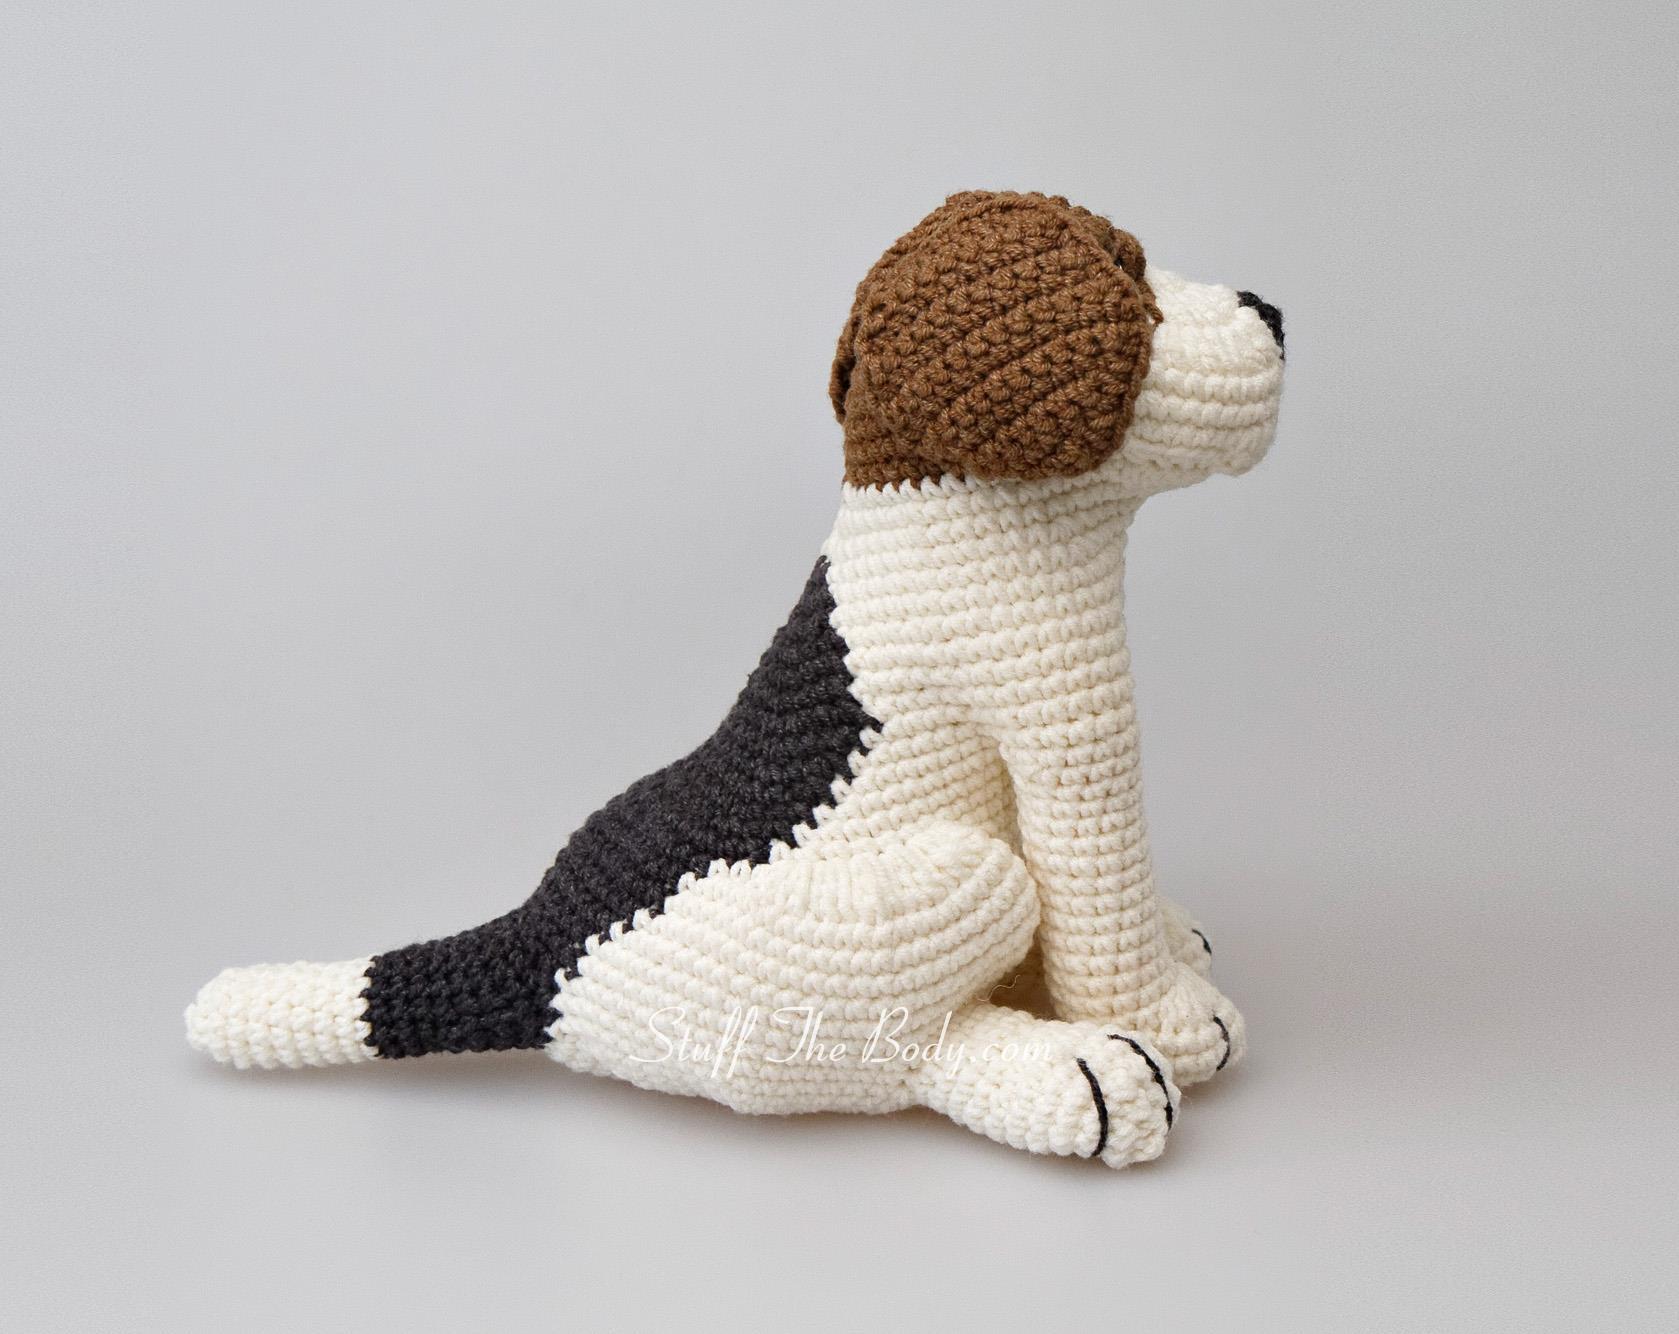 Amigurumi Lion Perritos : Azor the beagle dog amigurumi pattern amigurumi pinterest